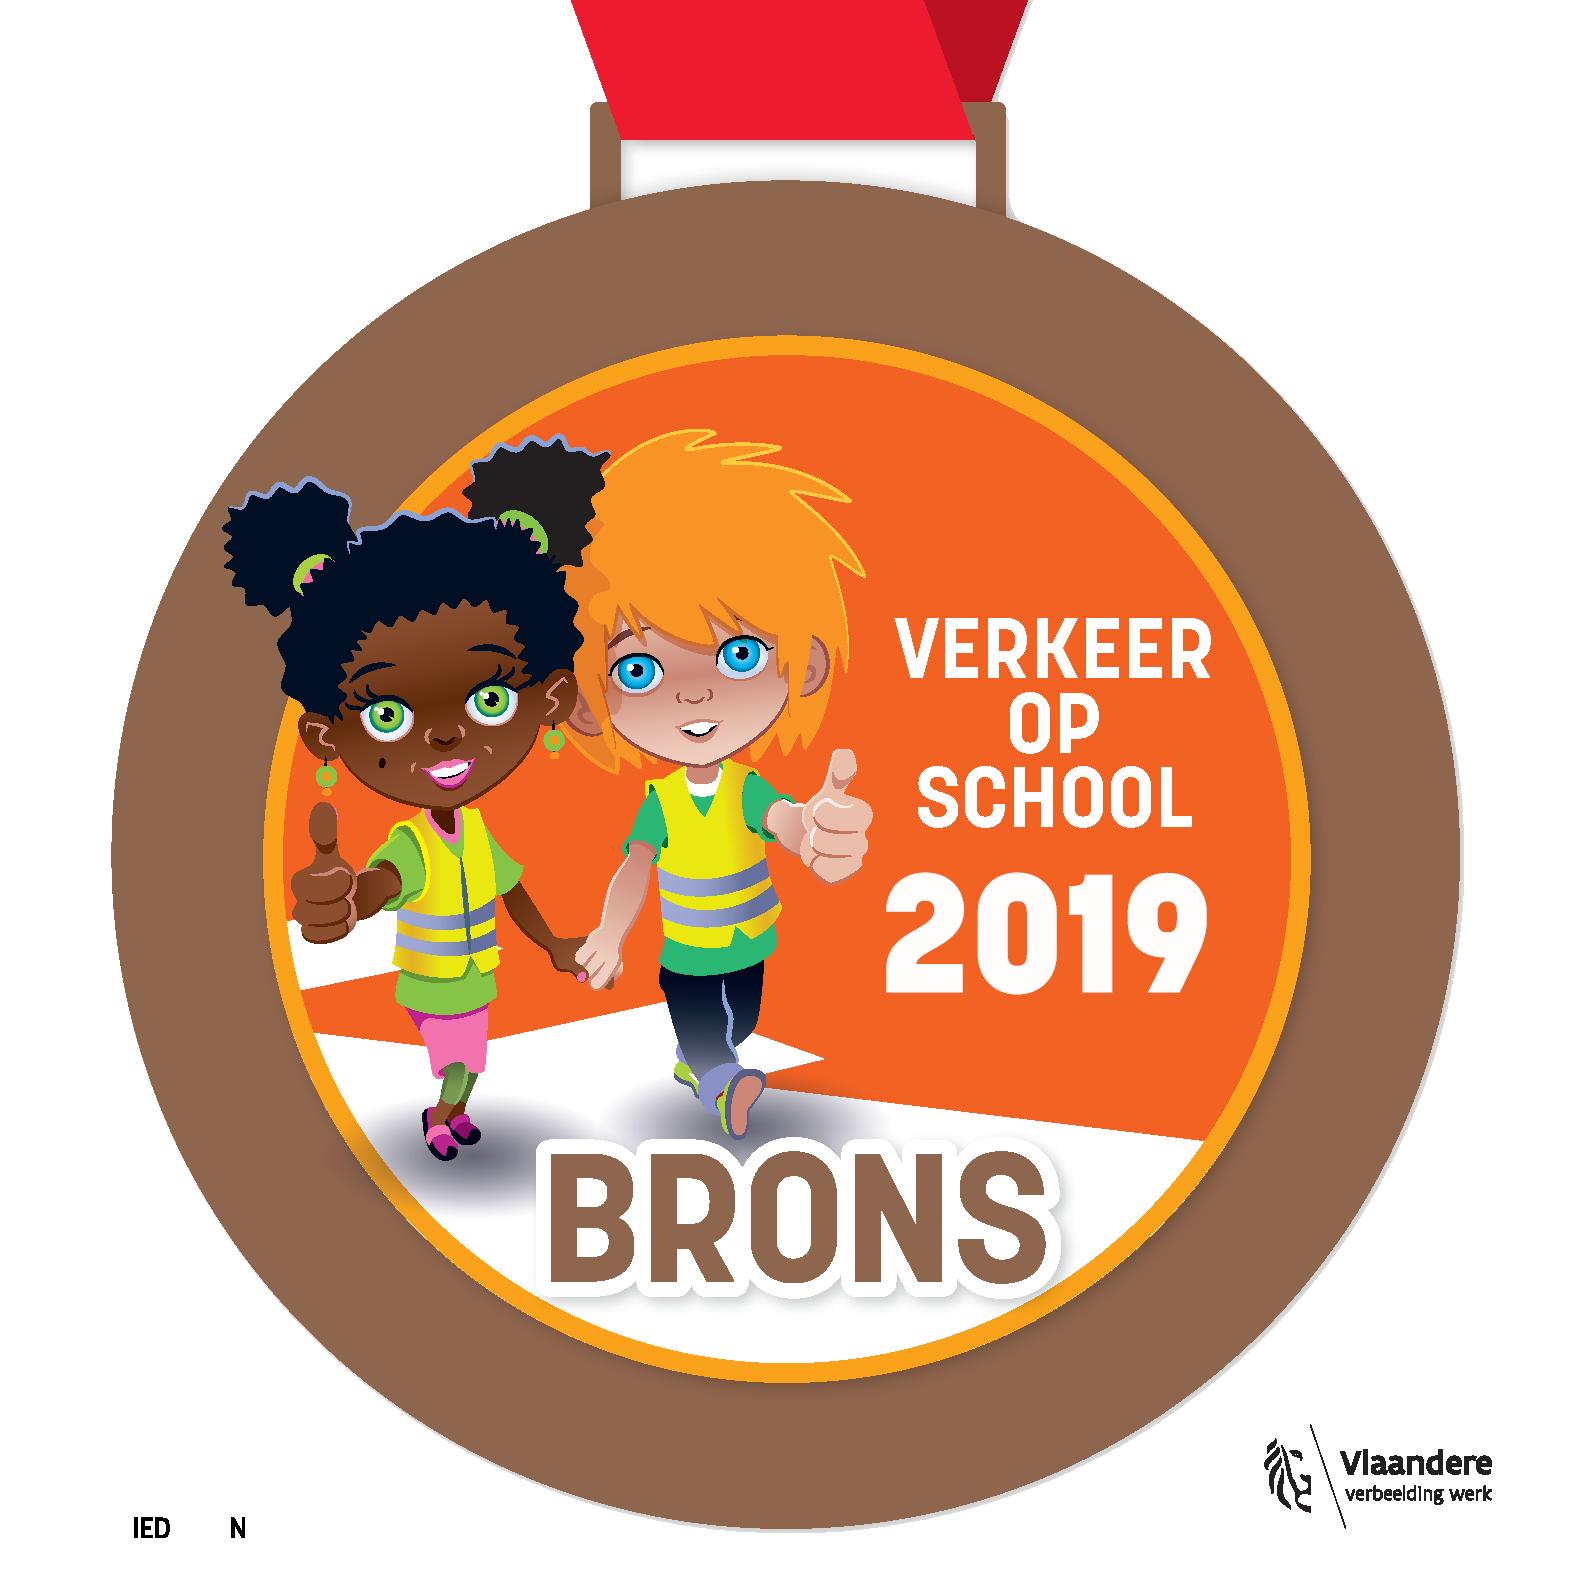 Verkeer op school - 2019 - brons